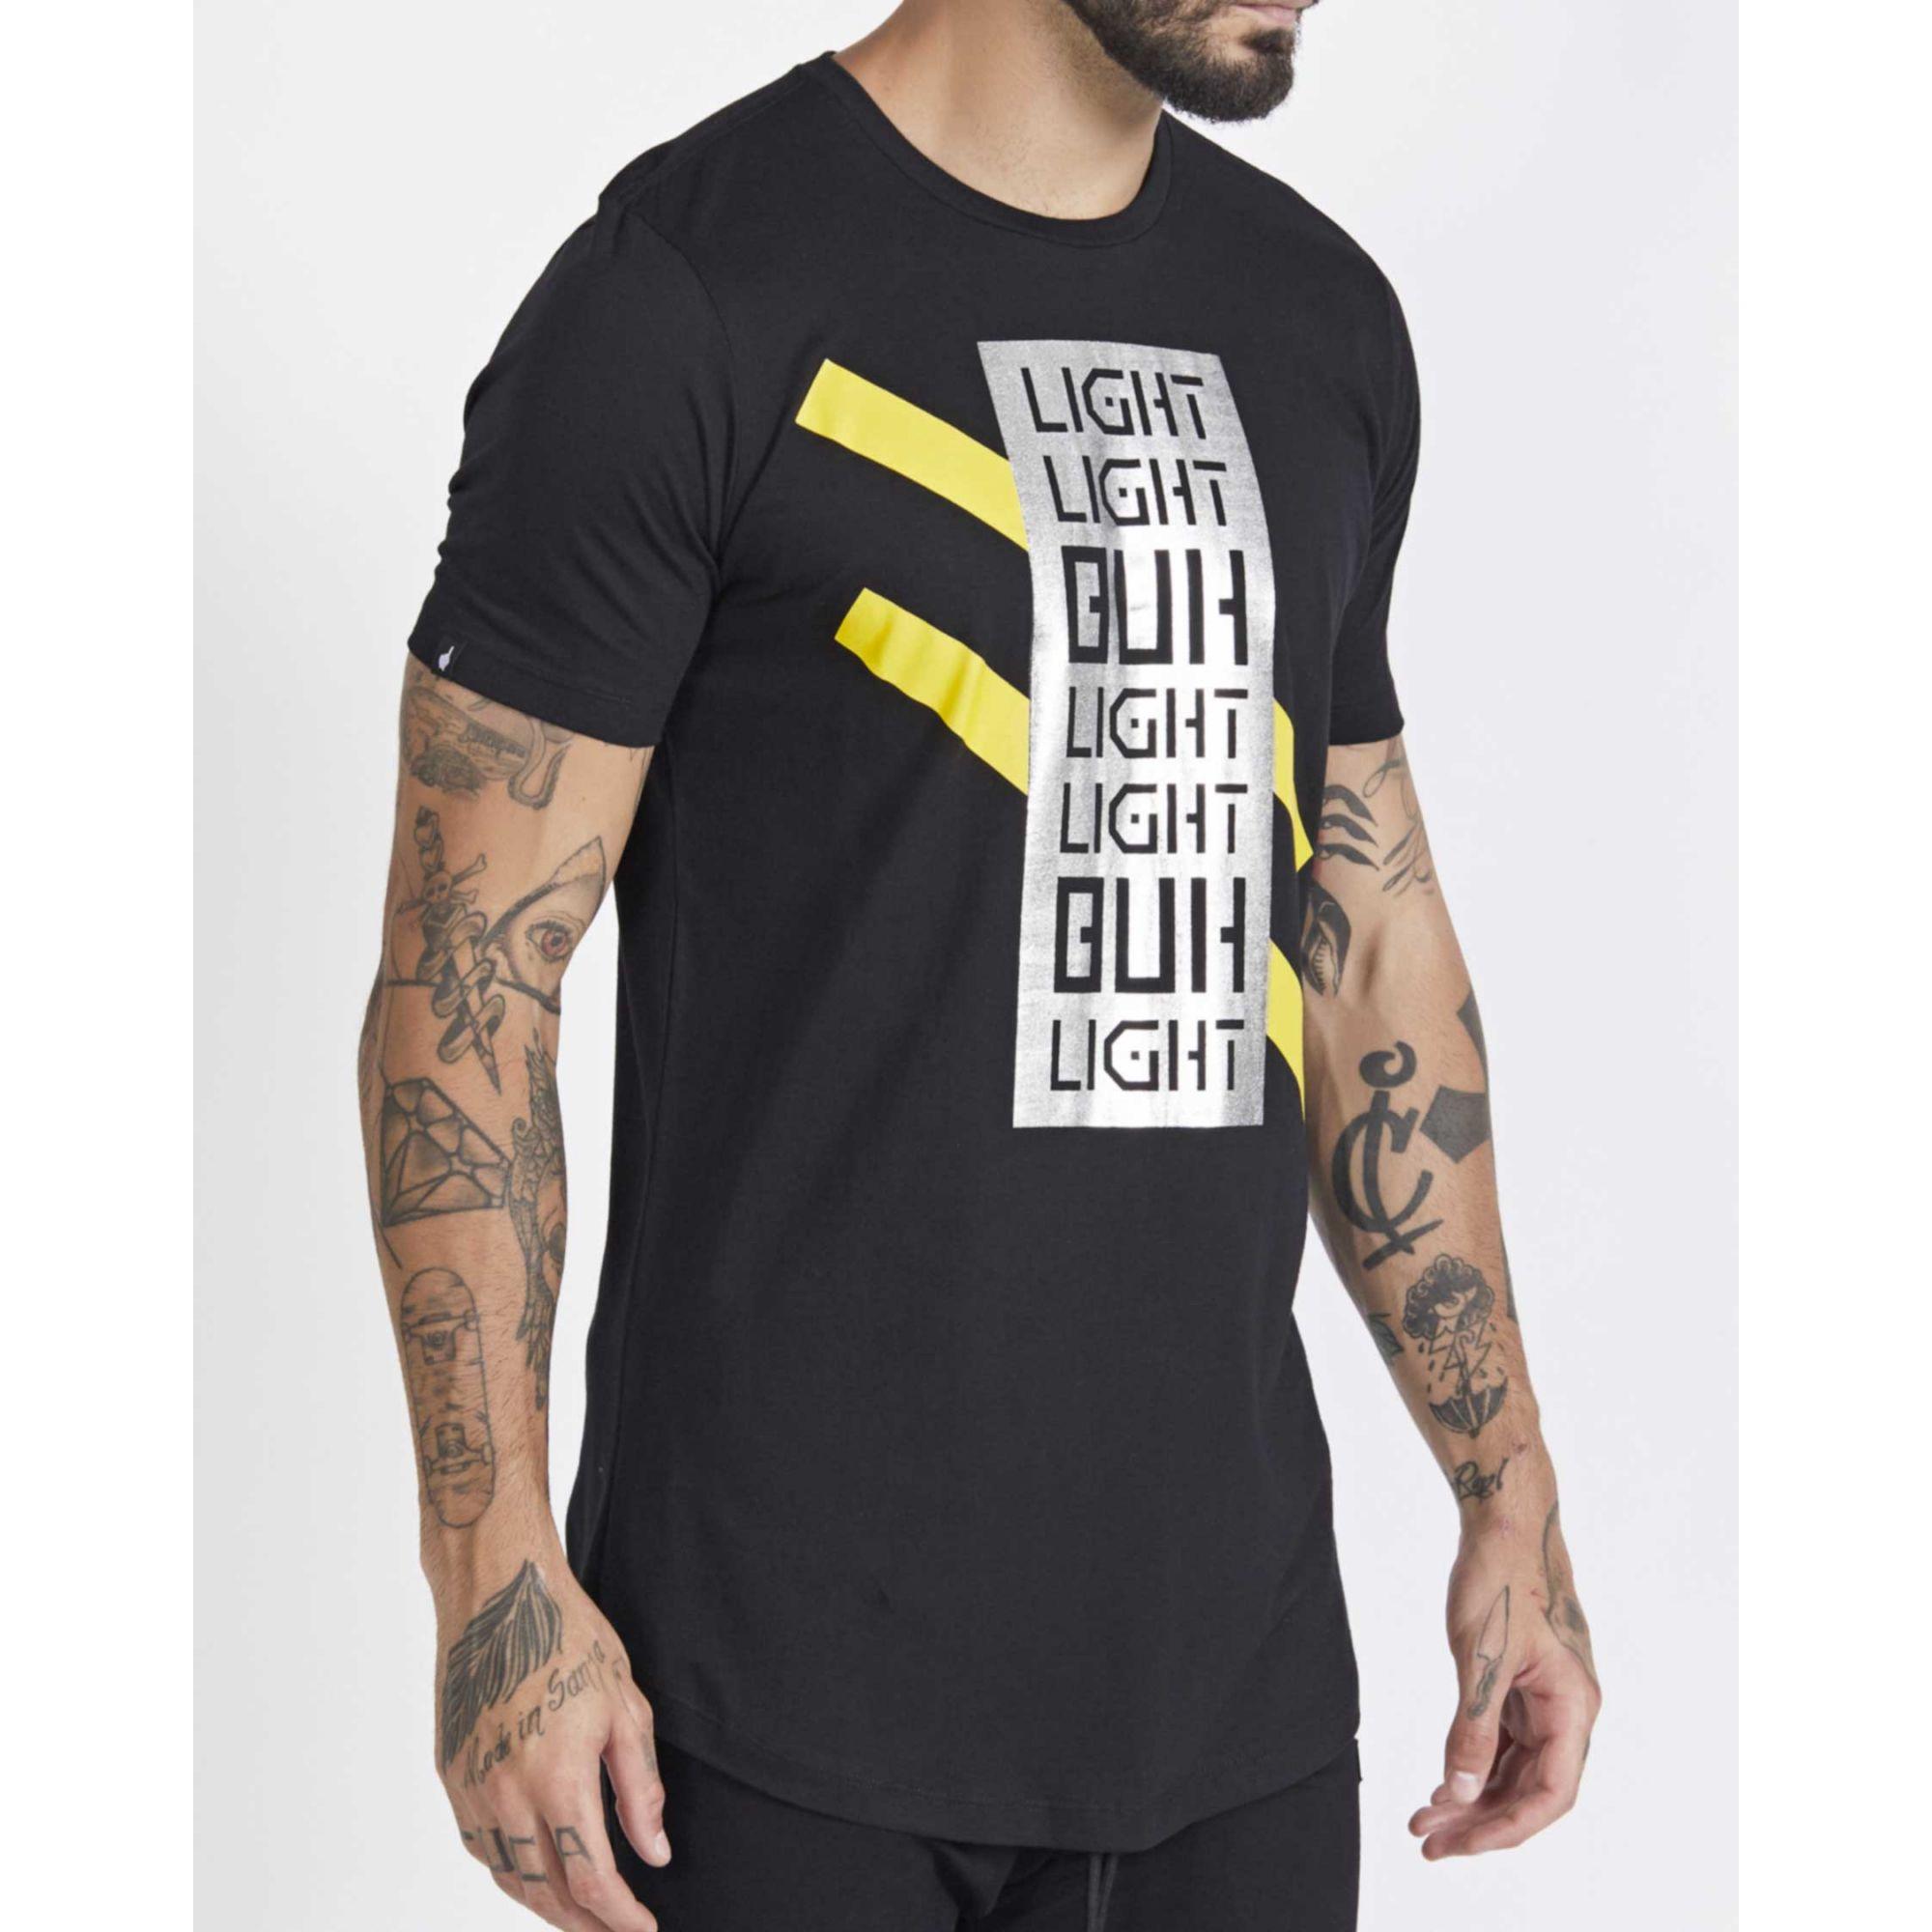 Camiseta Buh Light Foil Black